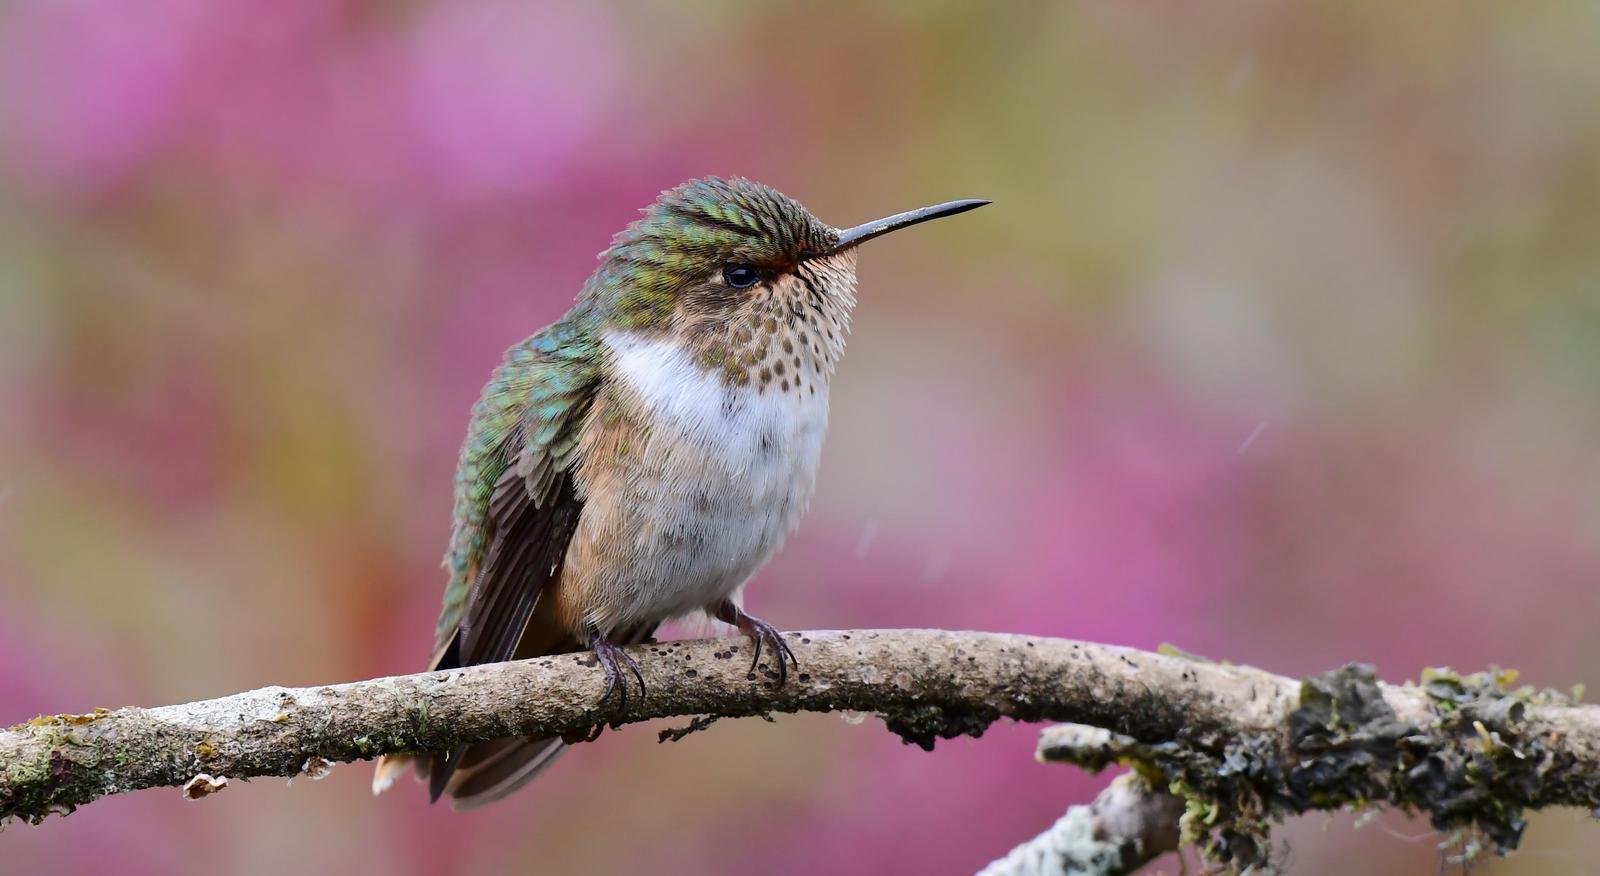 Volcano Hummingbird Photo by Gareth Rasberry